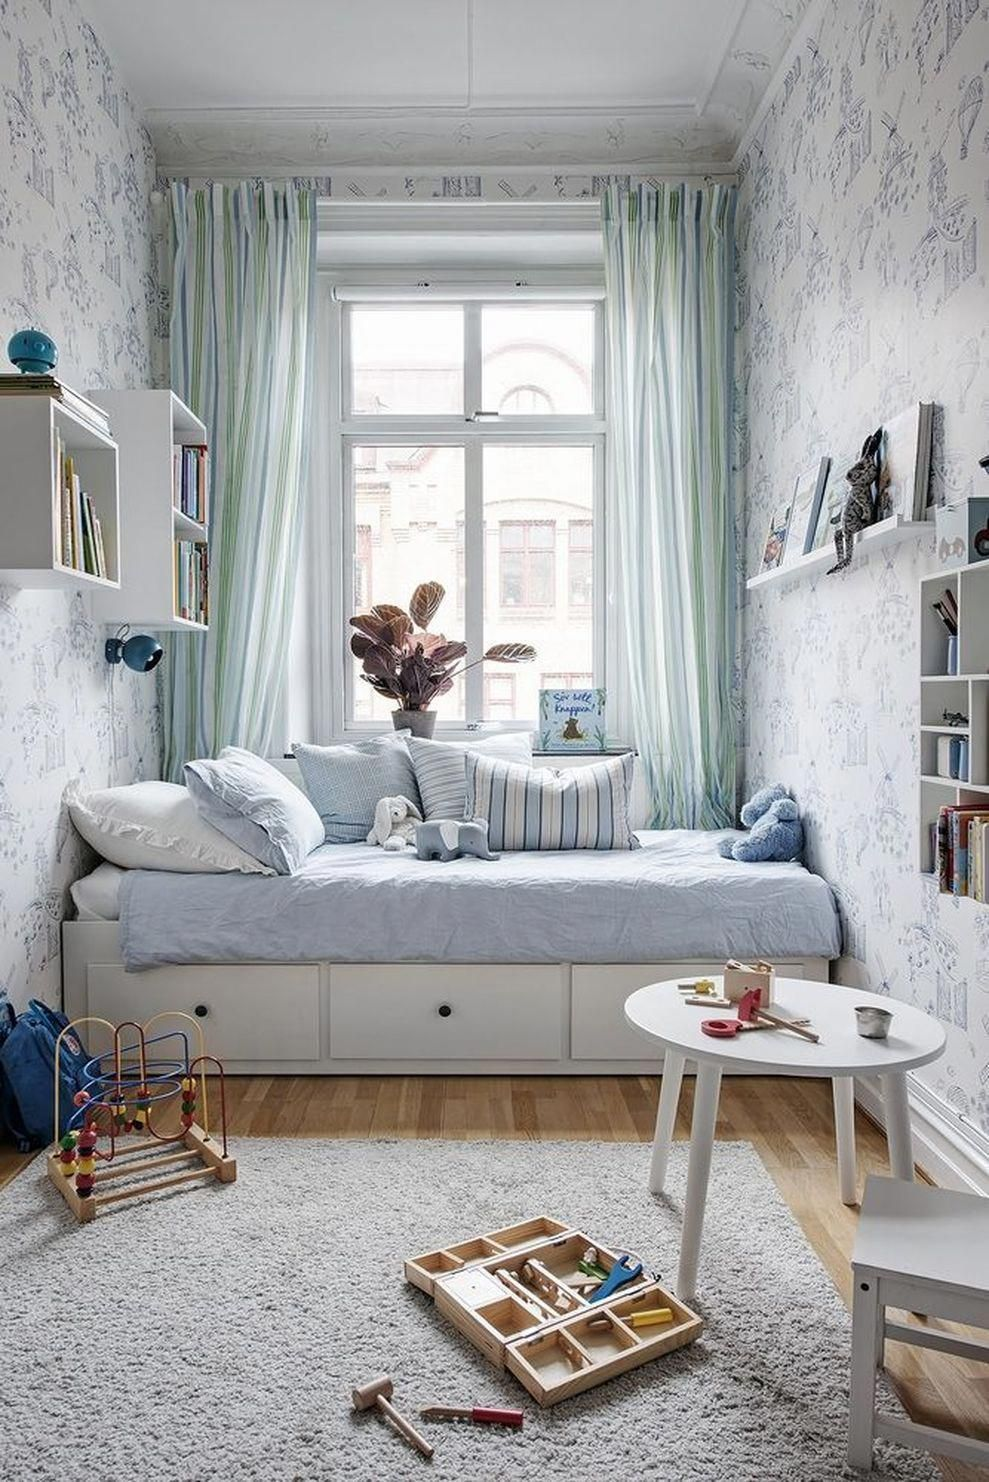 Small Room Design Ideas Philippines Smallroomdesign Apartment Bedroom Design Remodel Bedroom Small Room Design